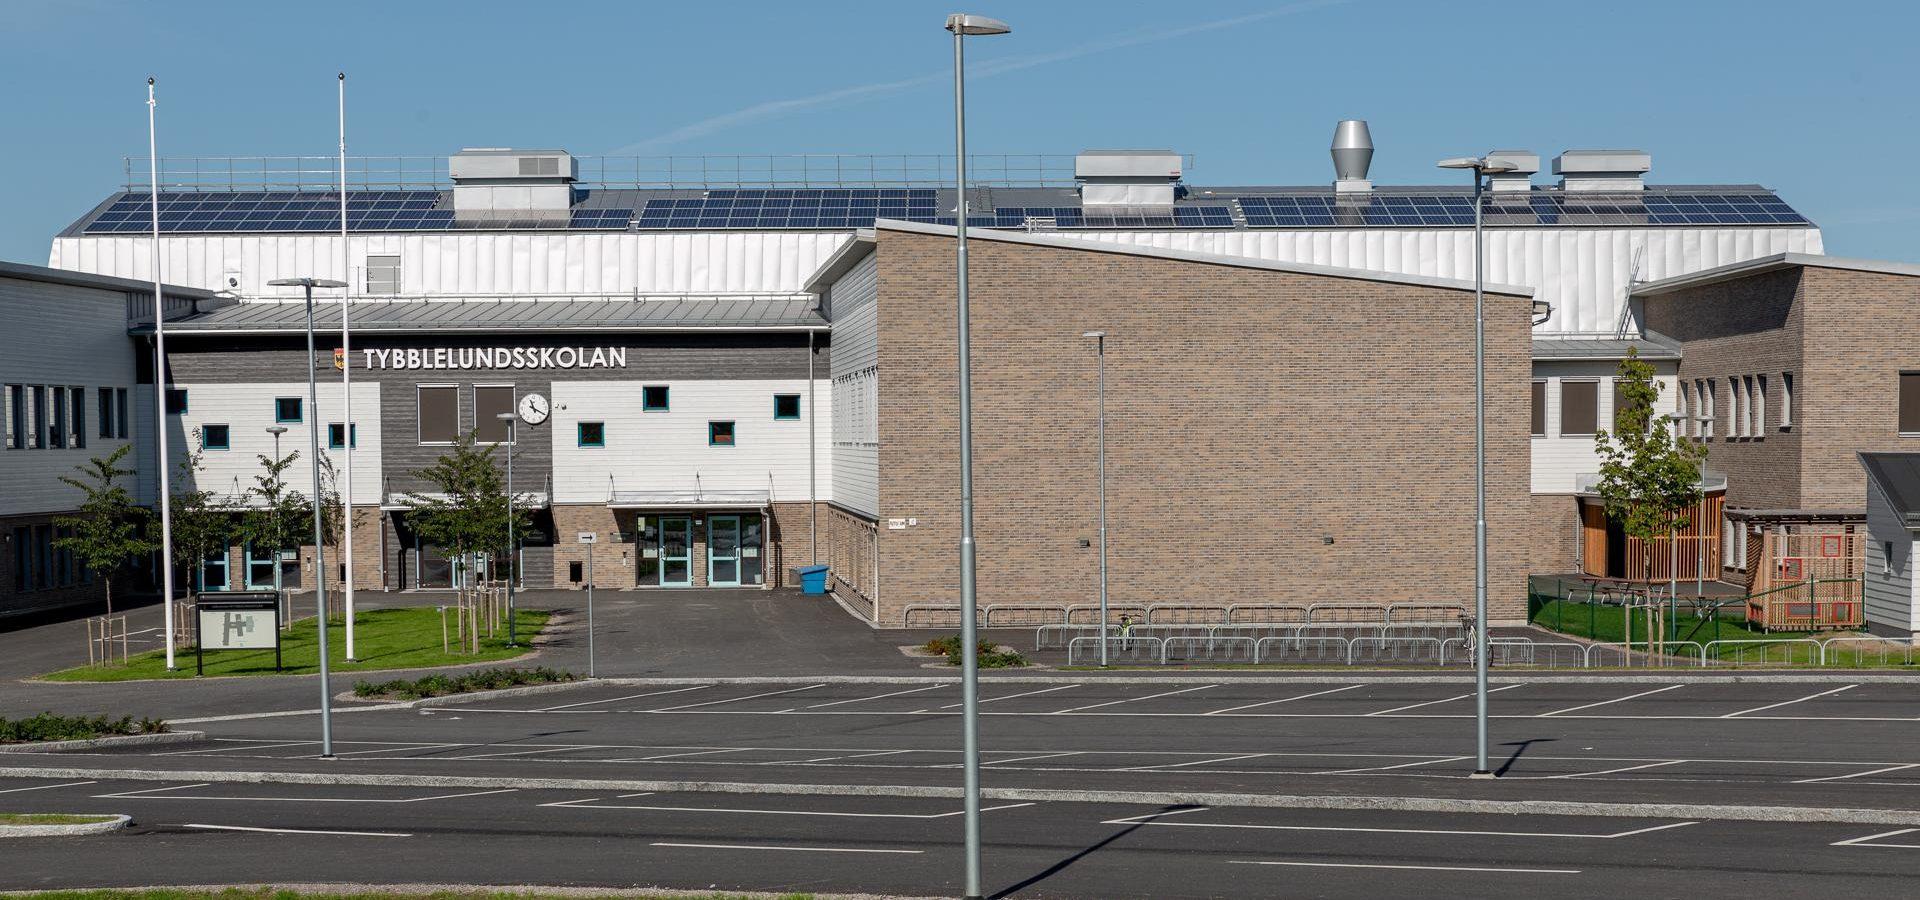 tybblelund-skola-fotosf-bild